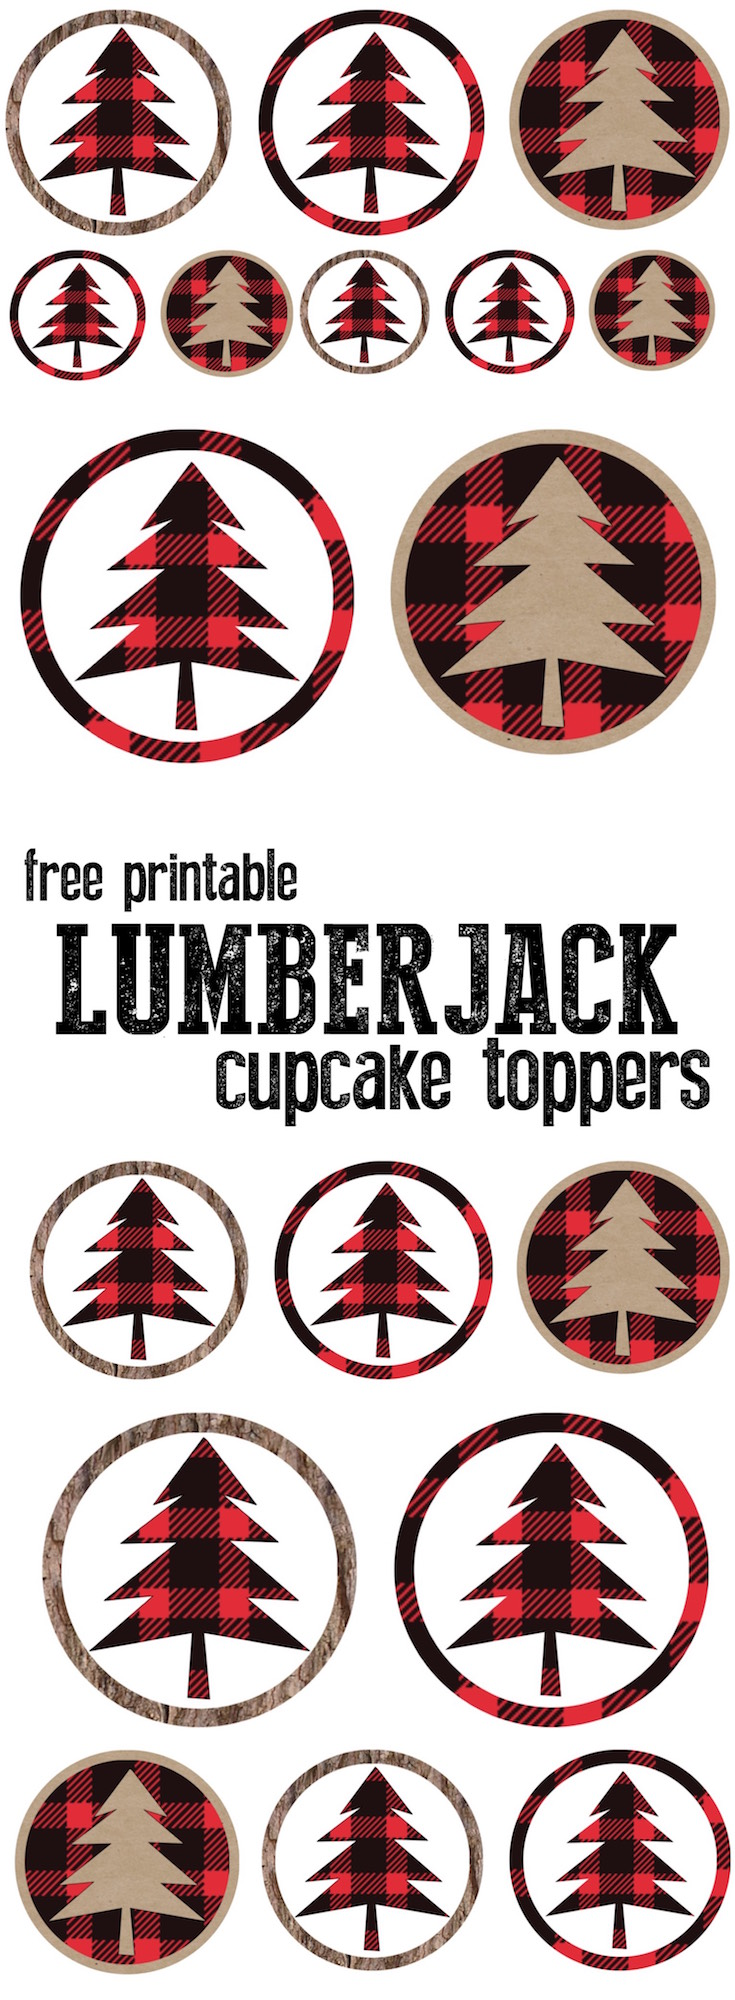 Lumberjack Cupcake Toppers Free Printable - Paper Trail Design